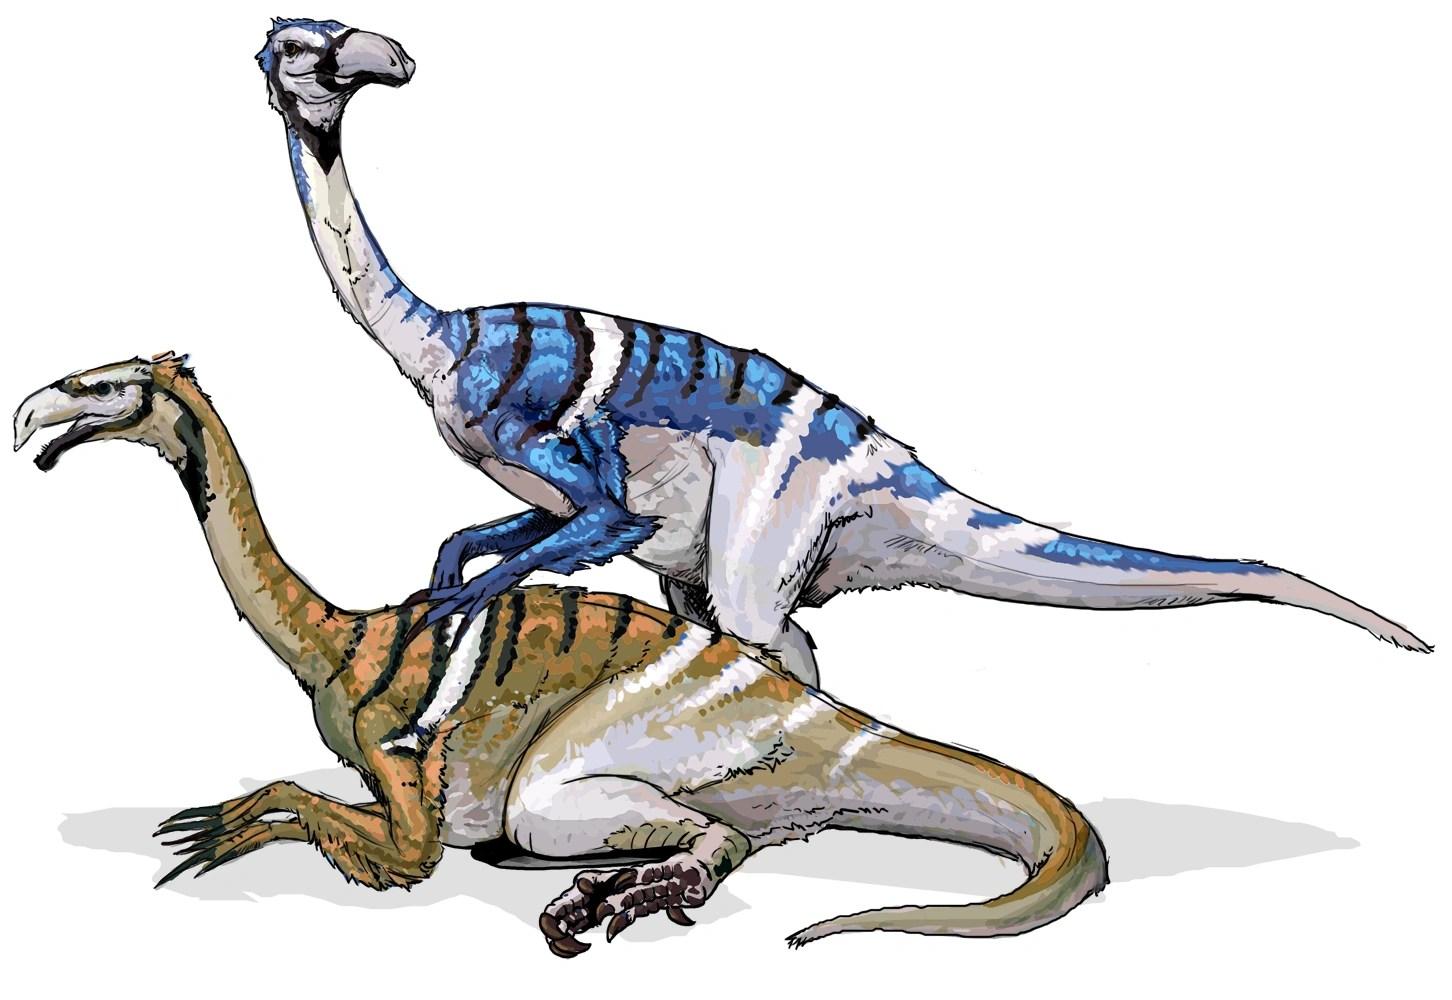 Nanshiungosaurus Dinosaur